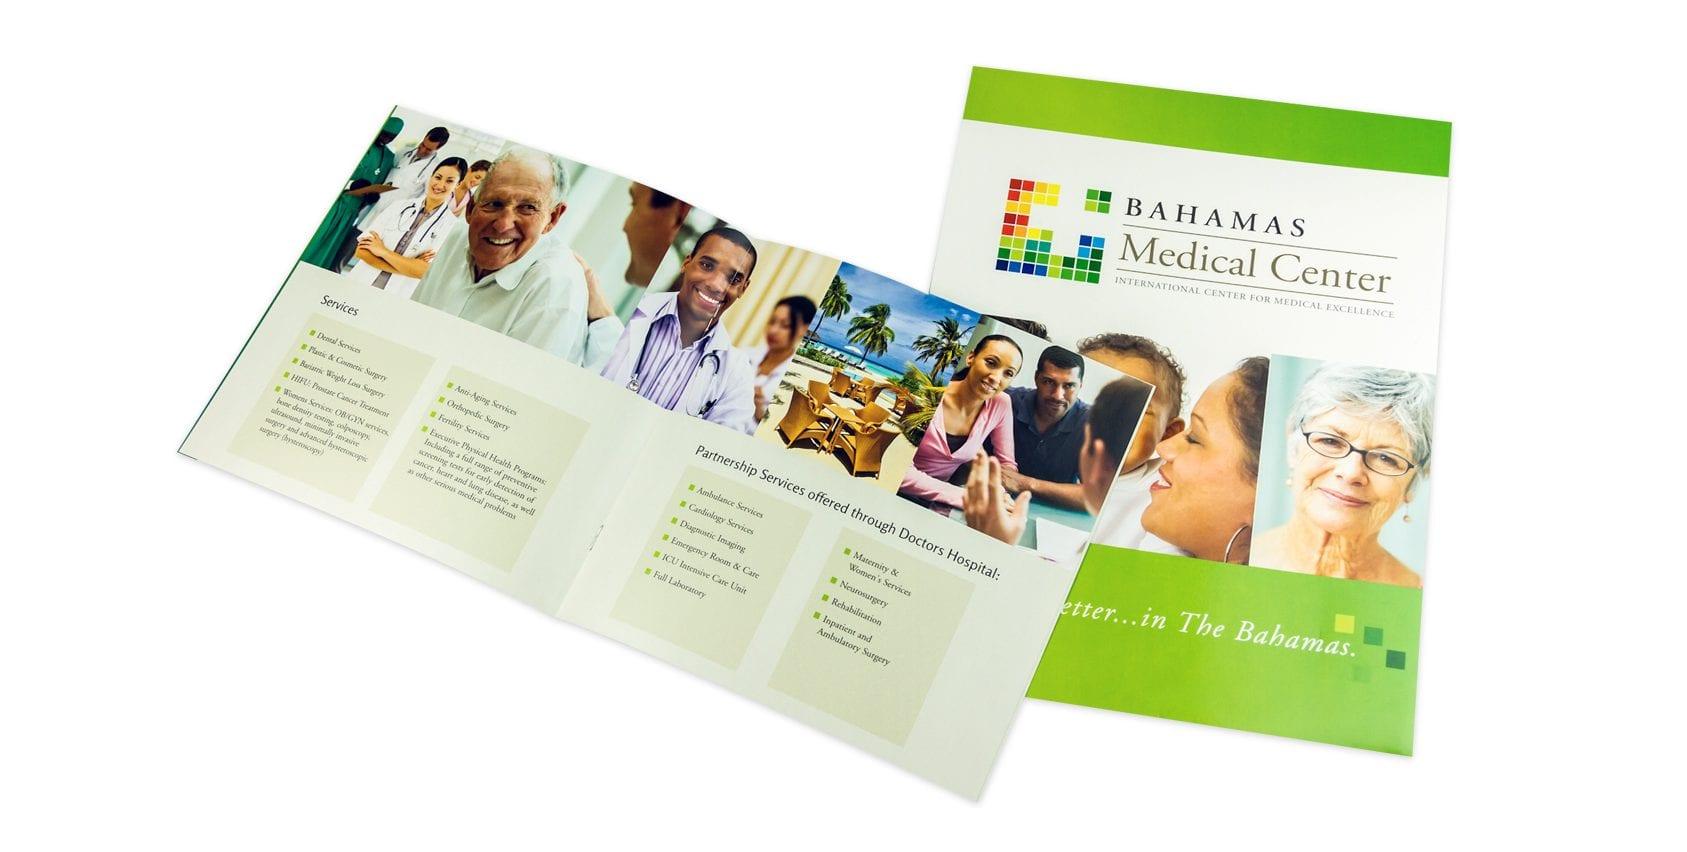 Bahamas Medical Center